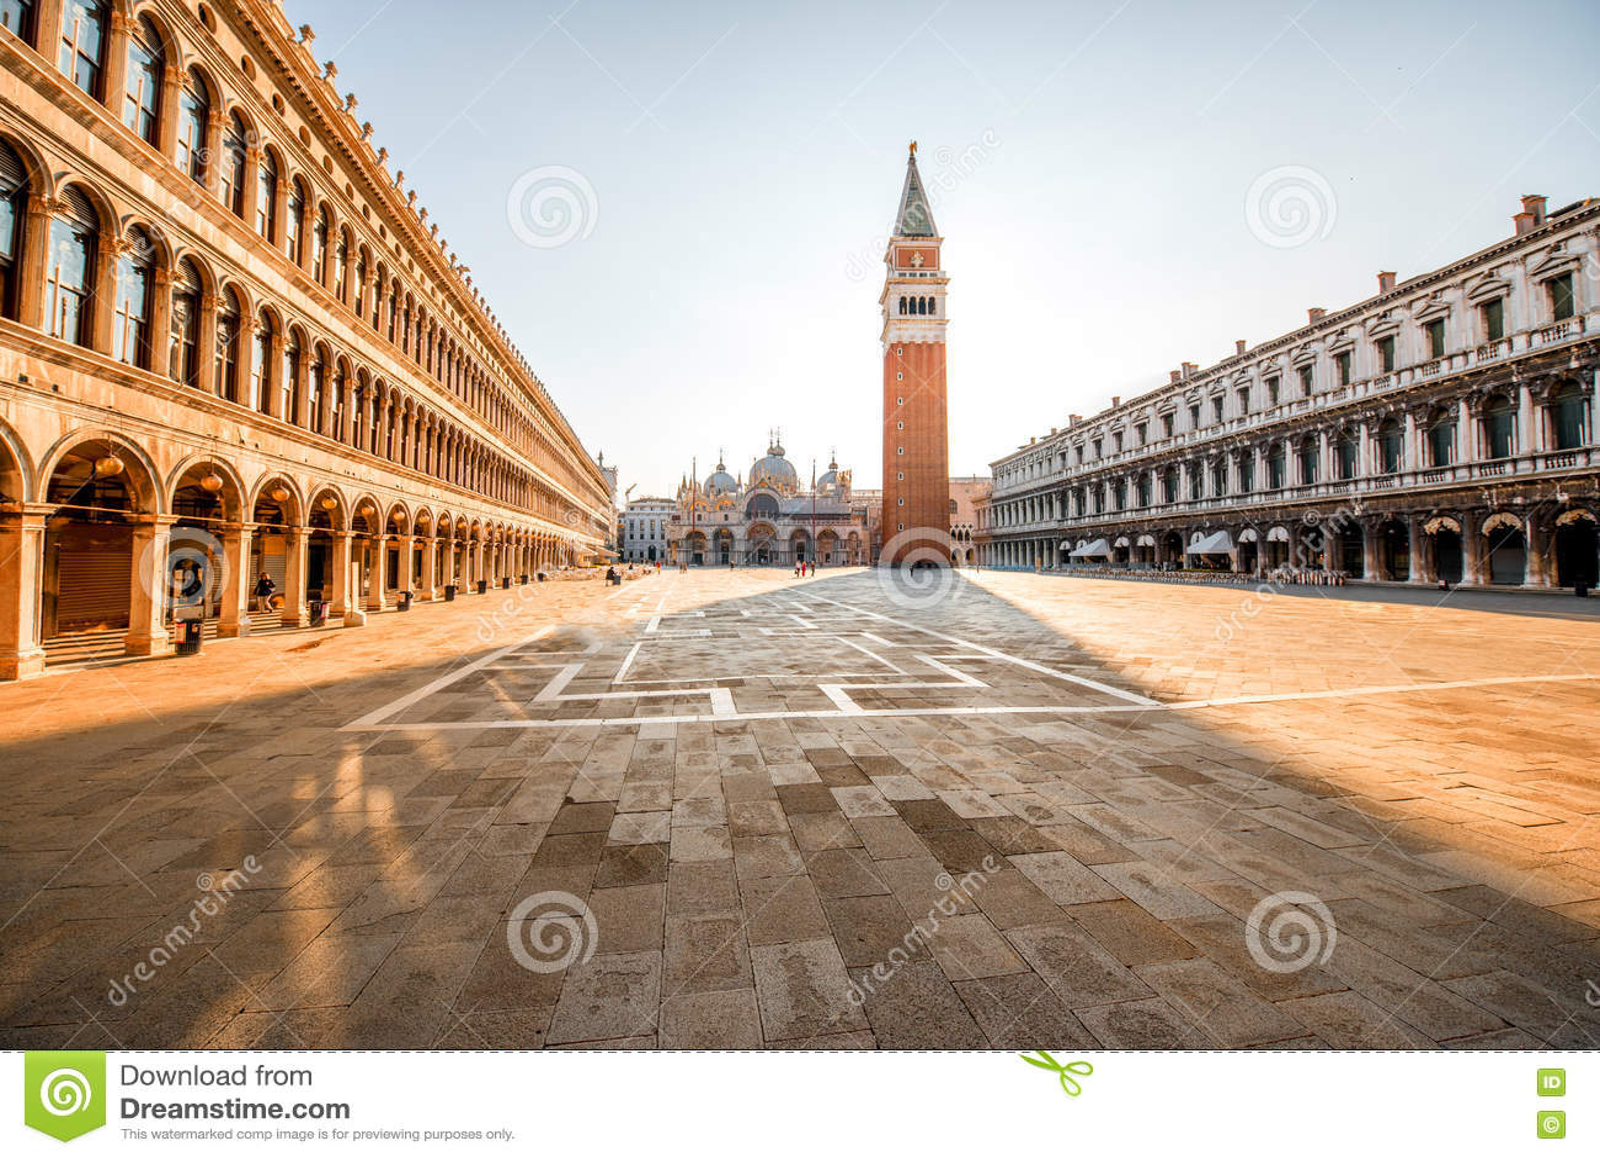 Venice central square stock image. Image of landmark - 76148773